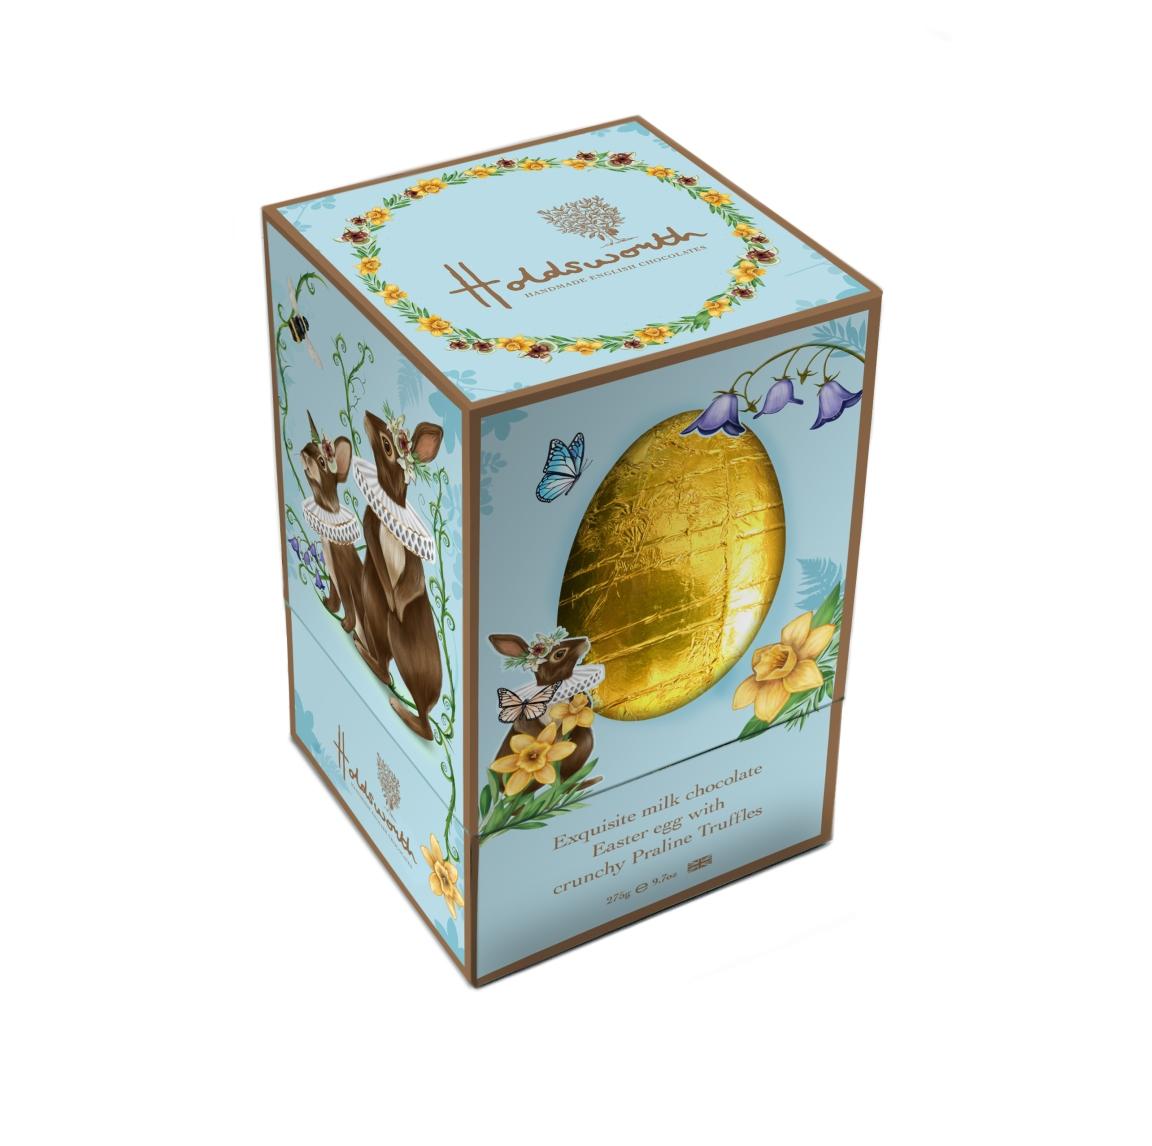 Crunchy Praline Adult Egg